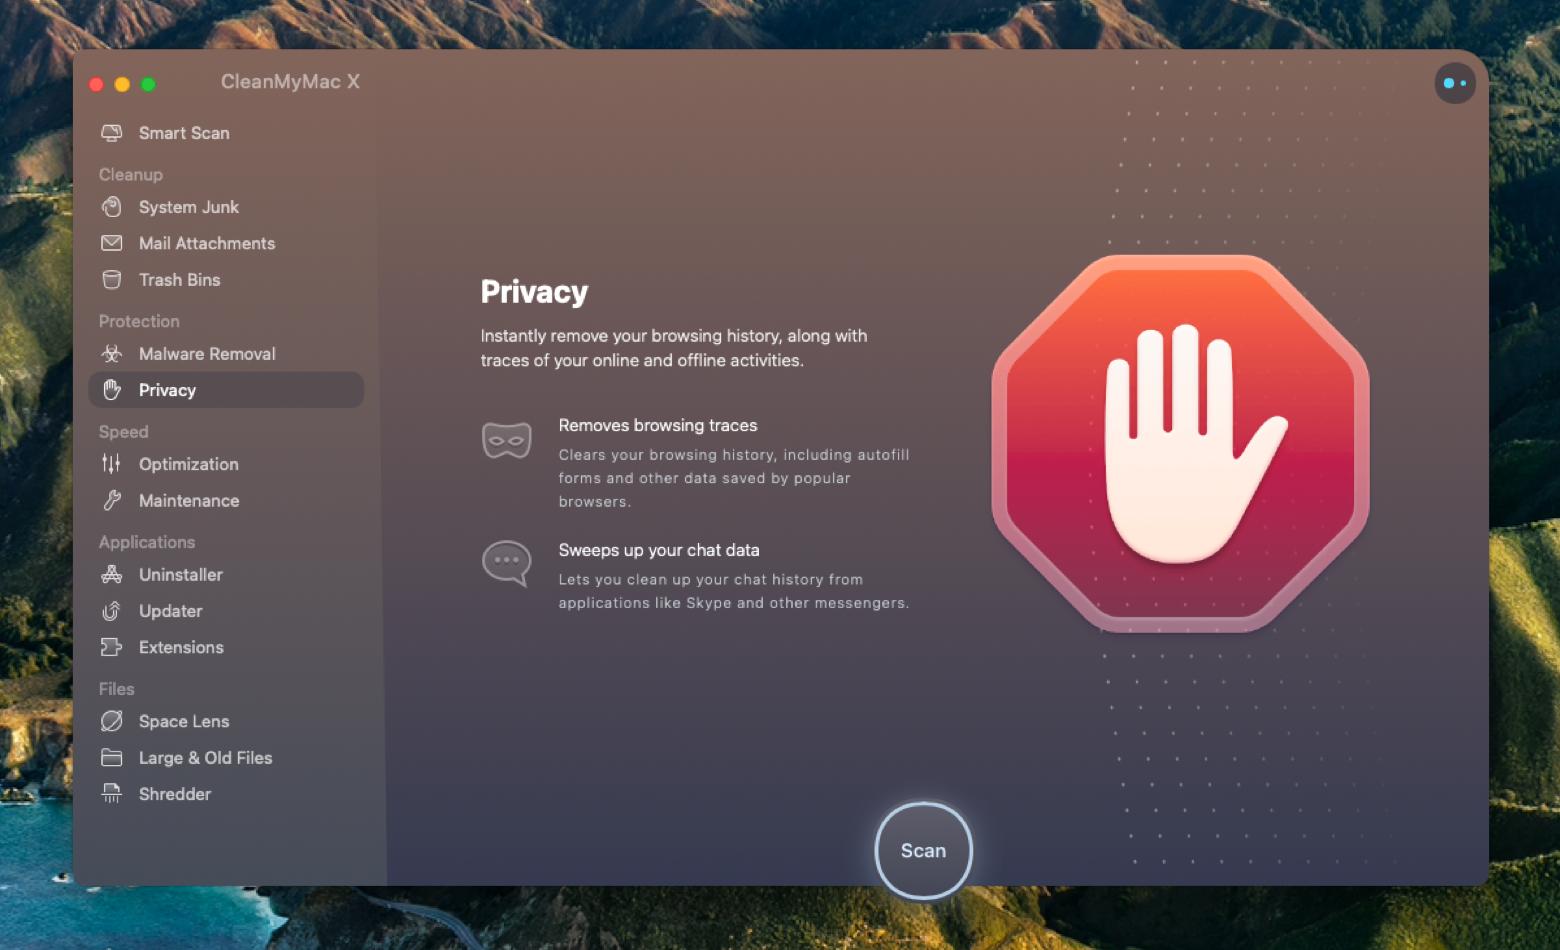 mac-privacy-sweep-cleanmymac-x